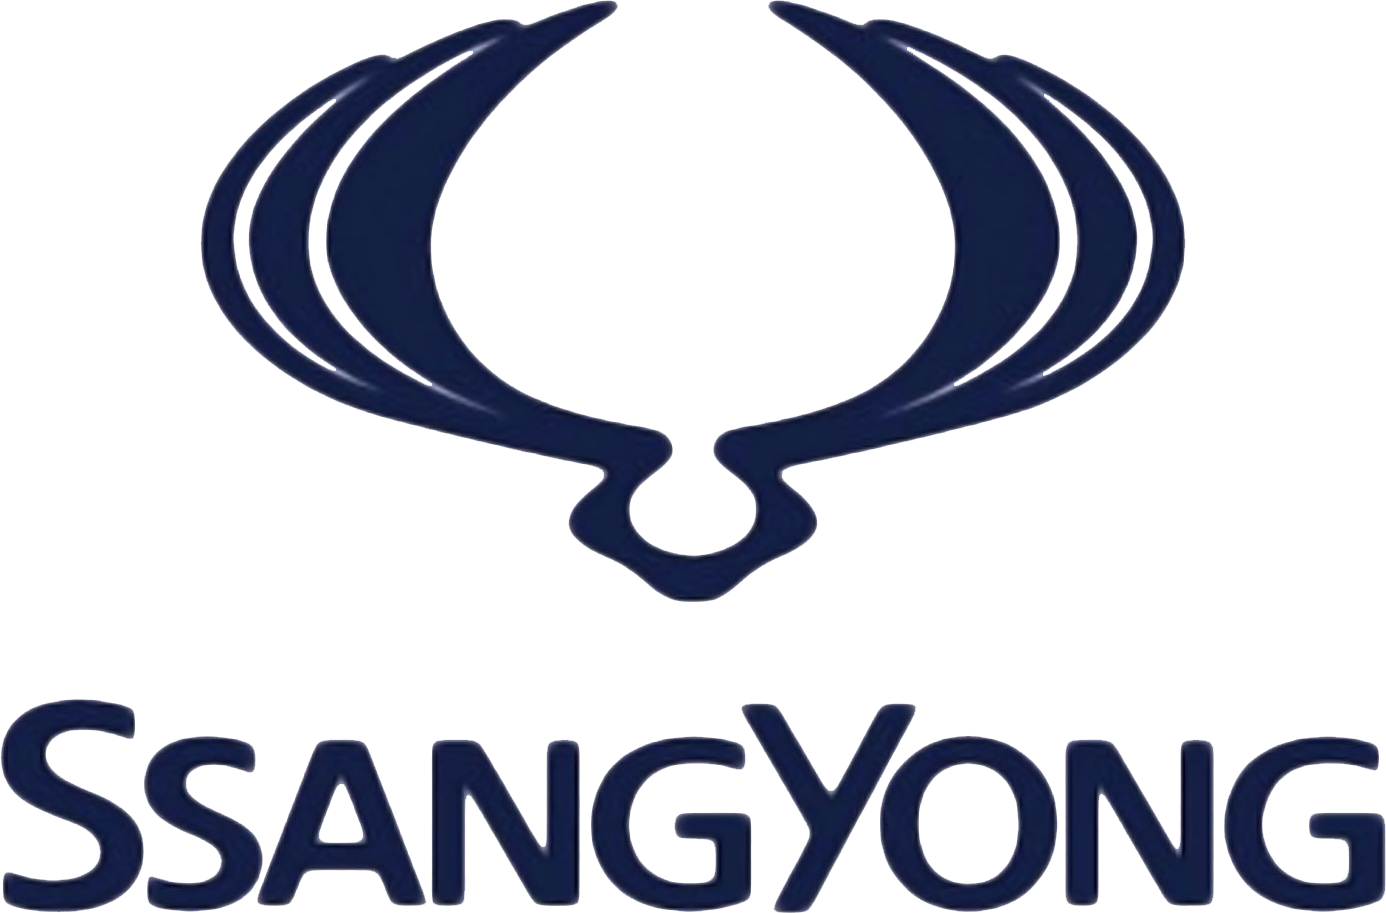 Ssangyong_tuning